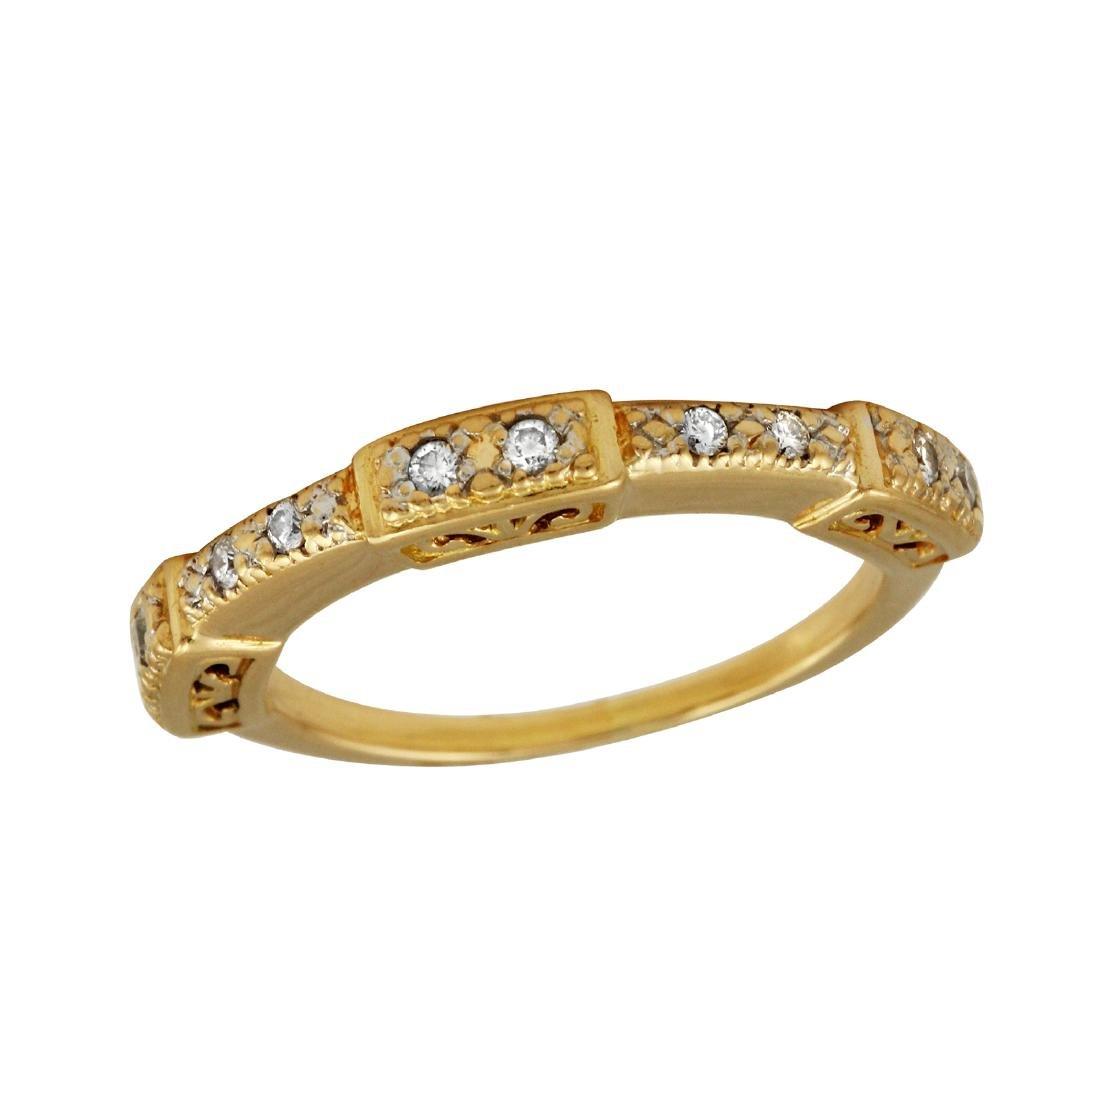 Philippe Charriol 18K Yellow Gold Diamond Ring